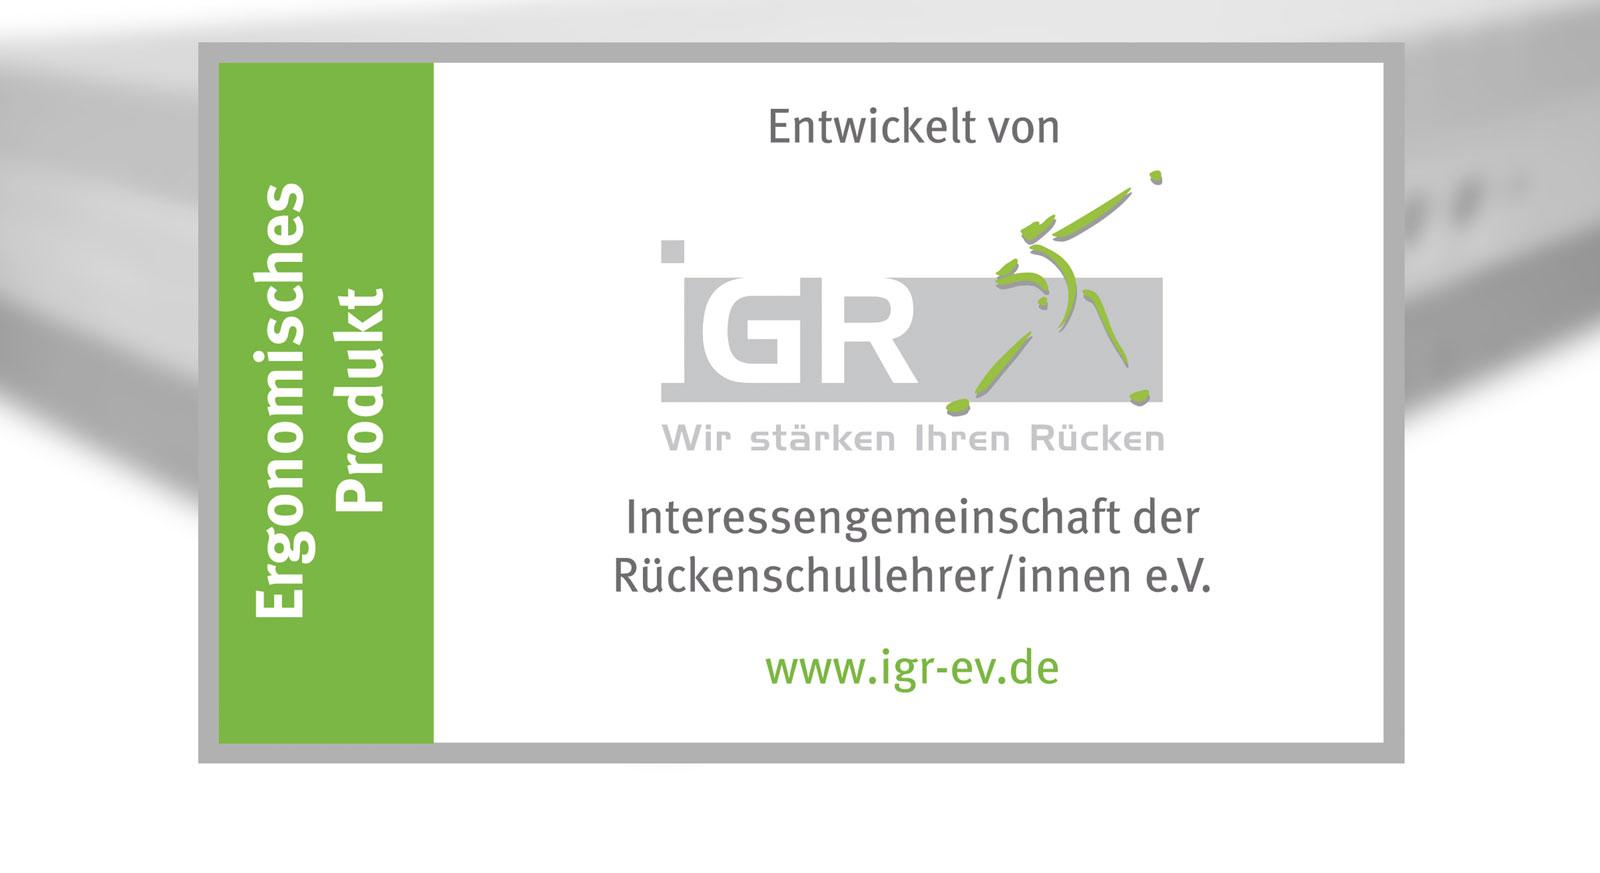 youSleep Matratze mit IGR-Siegel